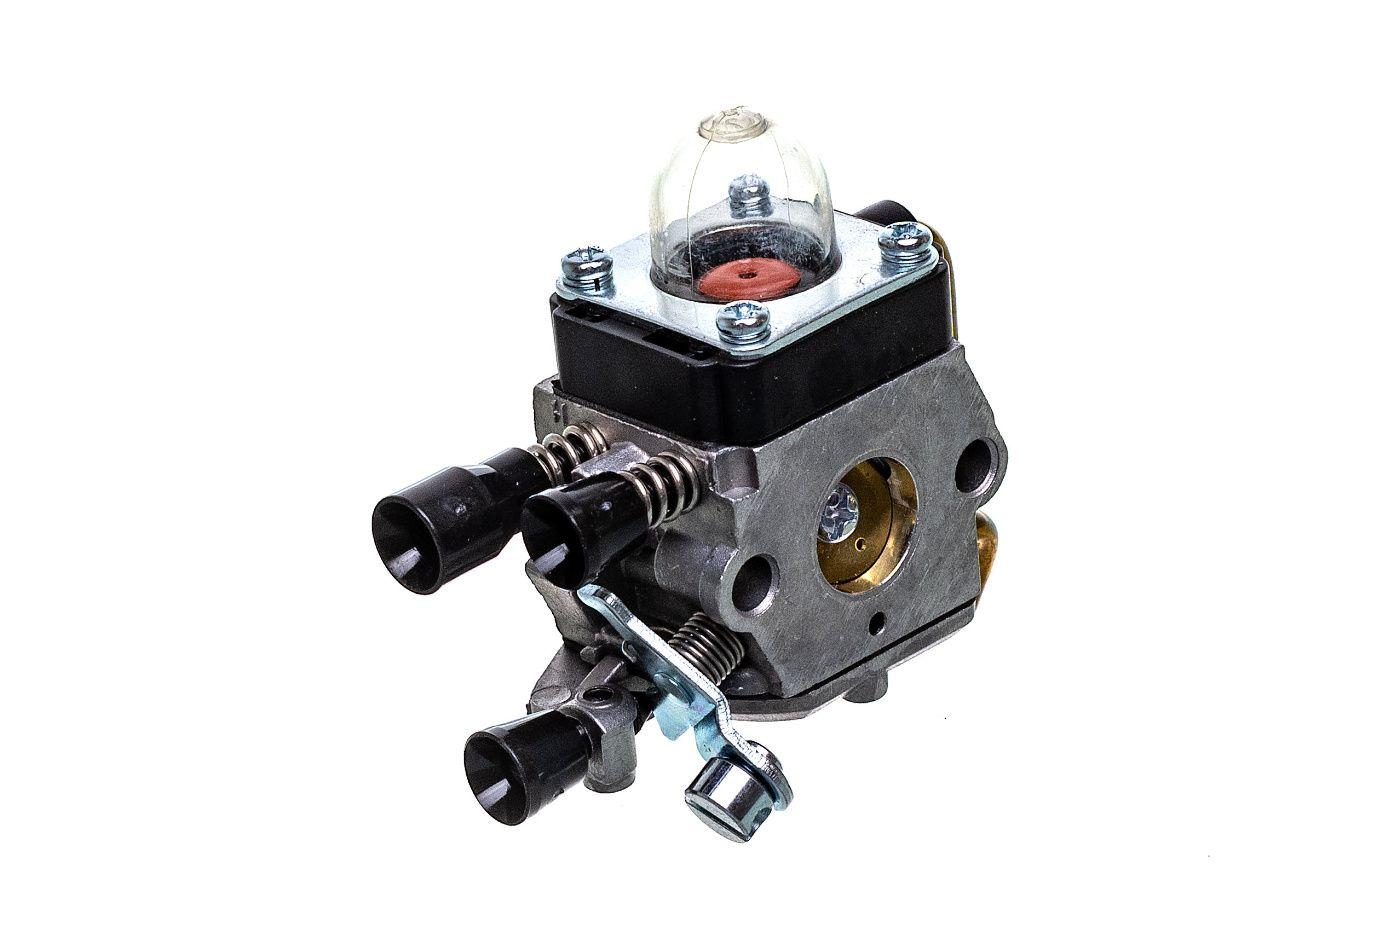 Karburátor Stihl FS FS38 FS45 FS46 FS55 FS74 FS75 FS76 FS80 FS85